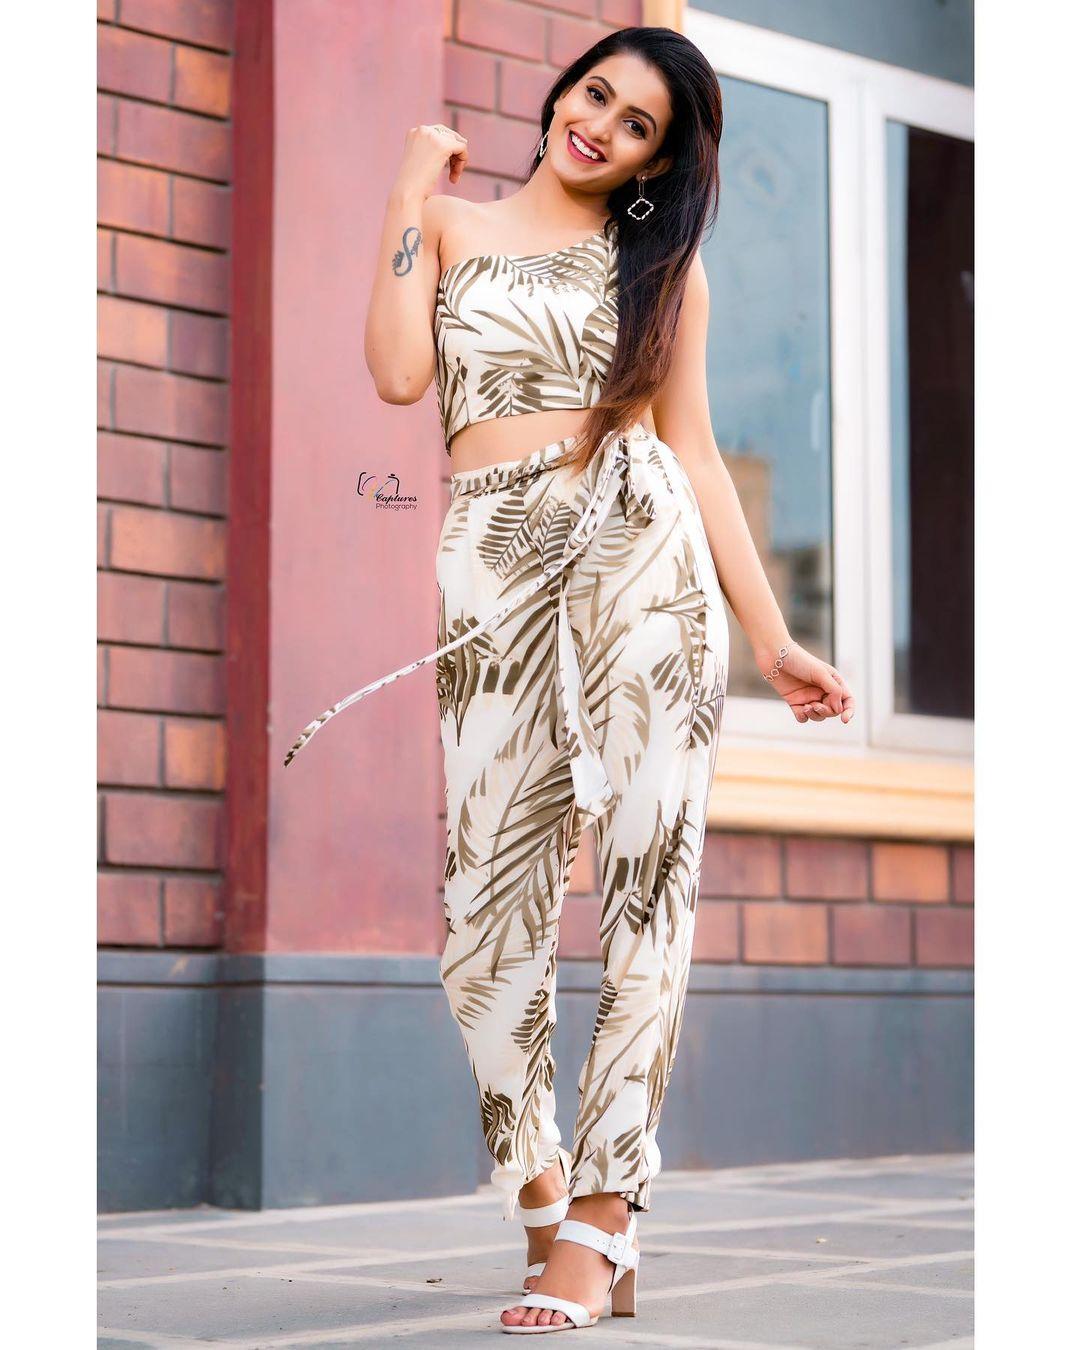 Glitter in the sky glitter in her eyes. Beautiful Deepiika pilli in  Jahnavi varma outfit. 2021-07-15